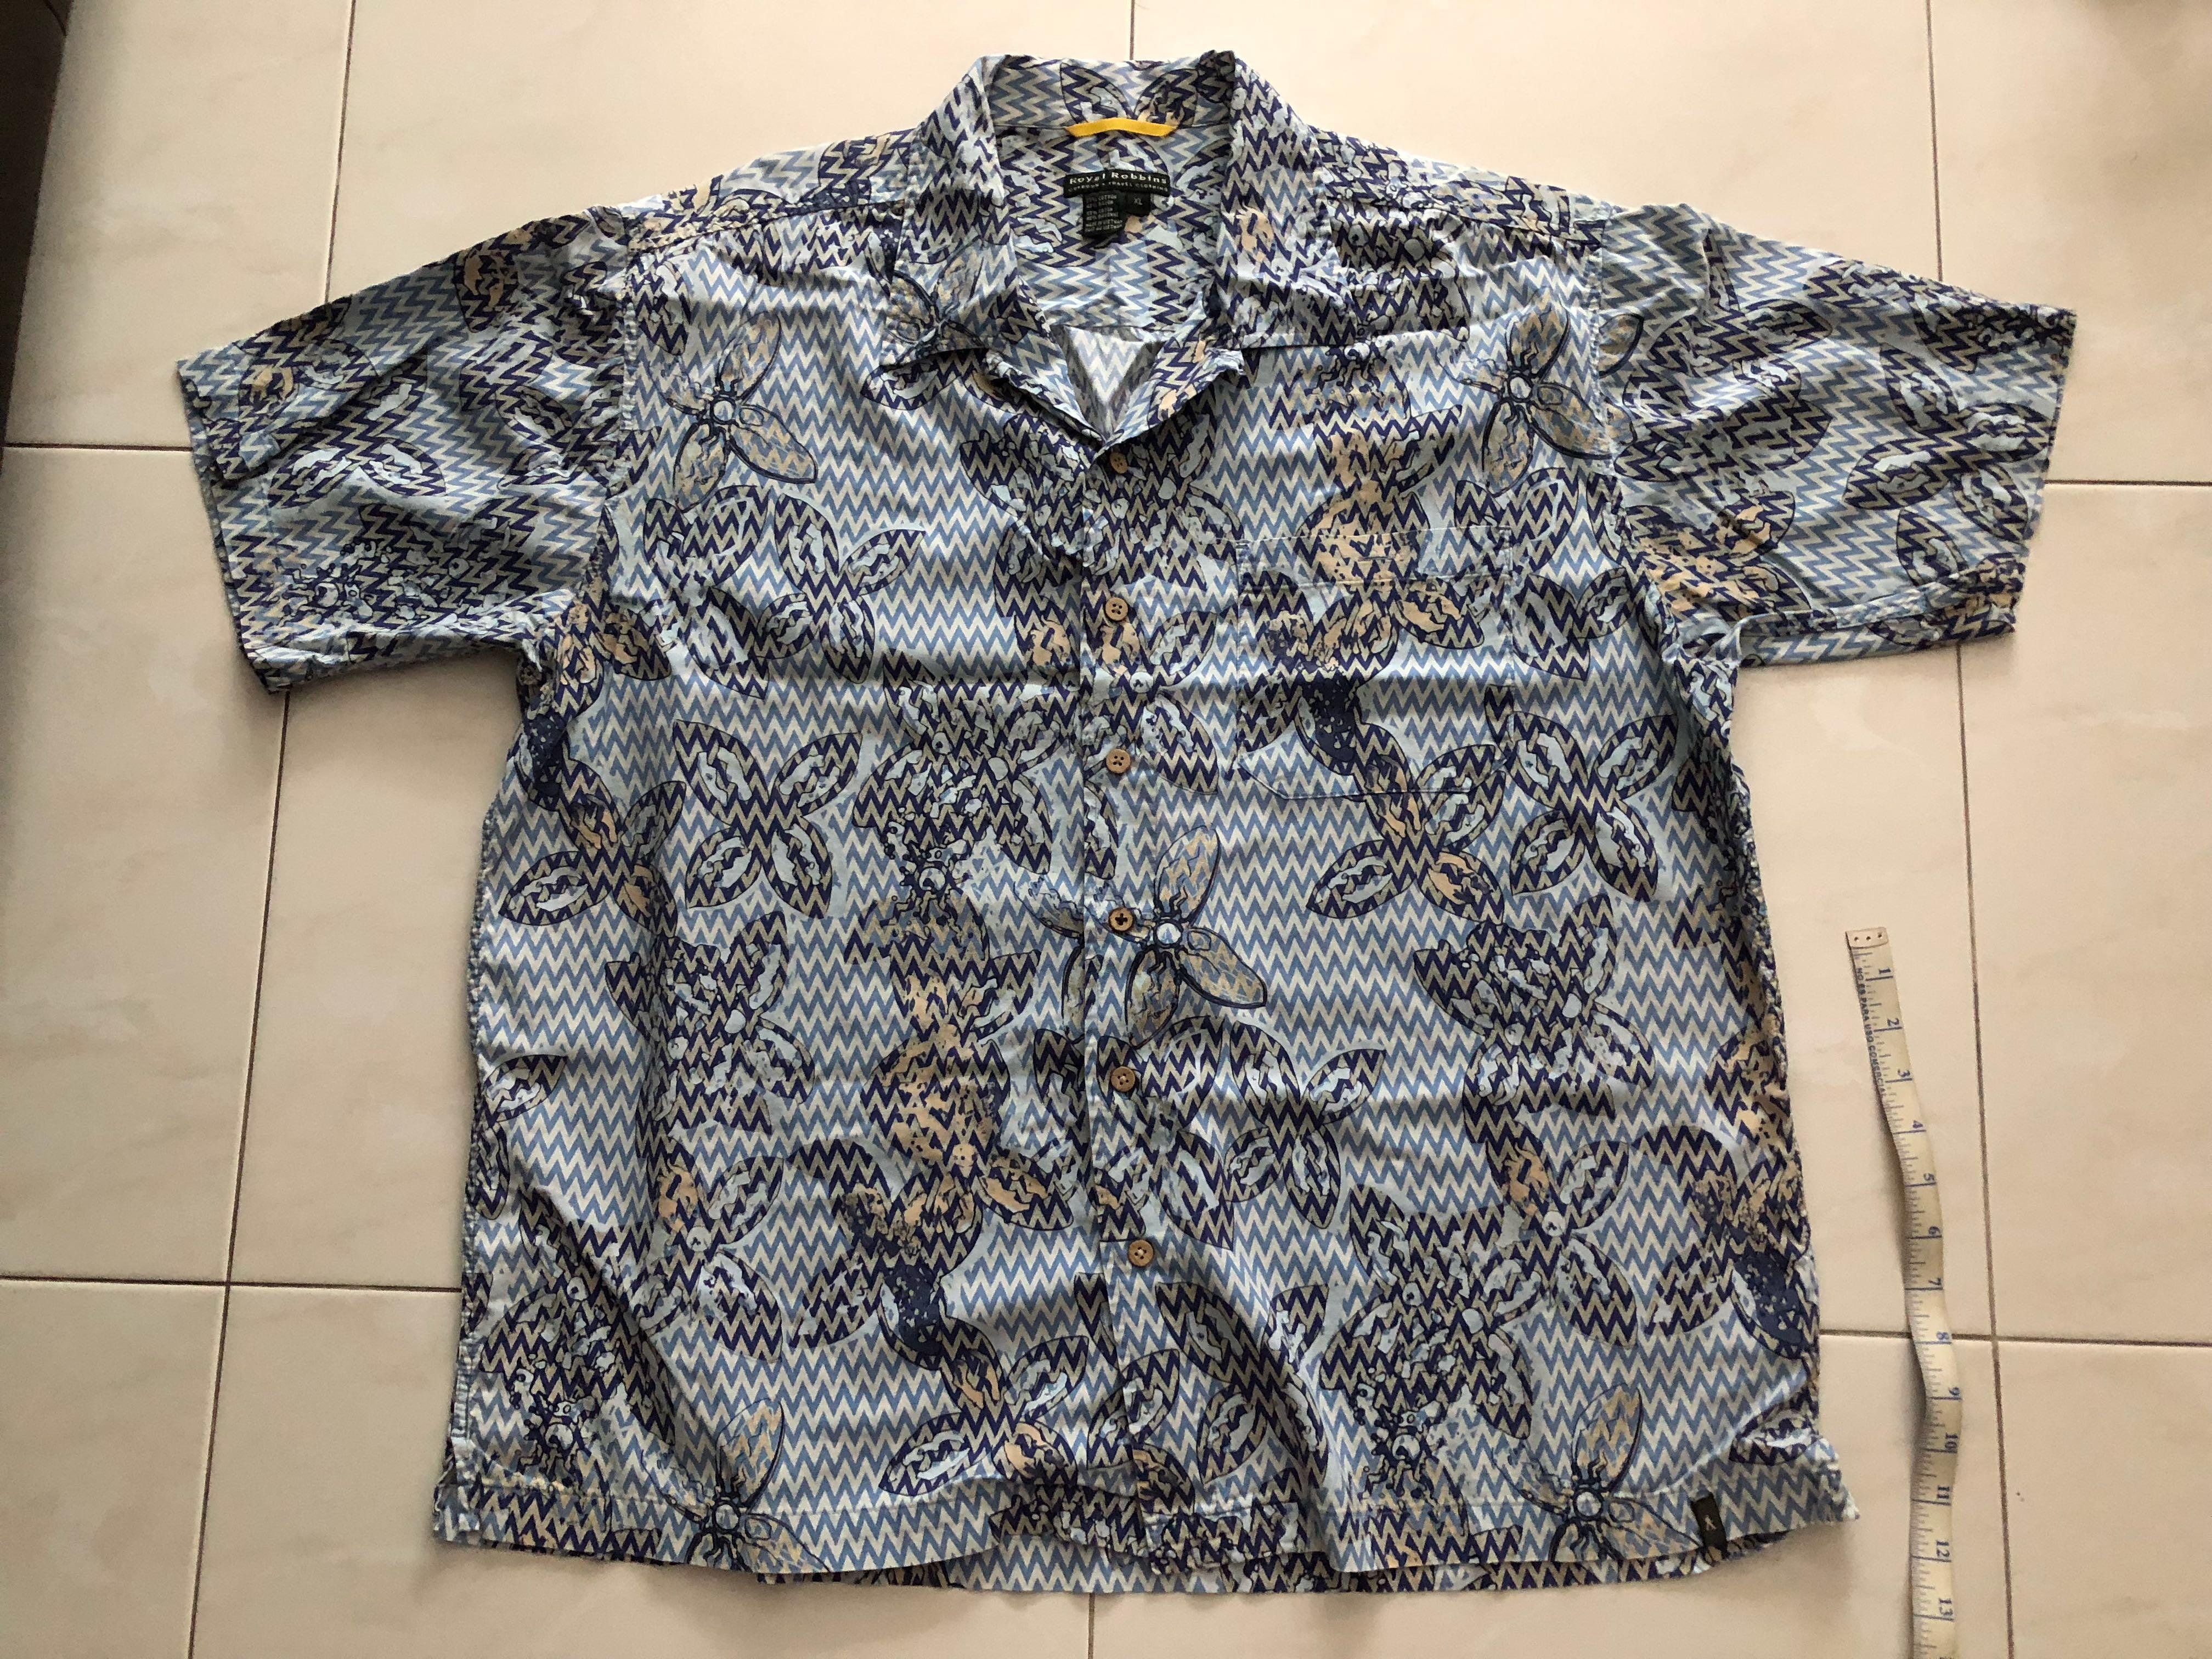 6c4b308c Hawaiian shirt, Men's Fashion, Clothes, Tops on Carousell